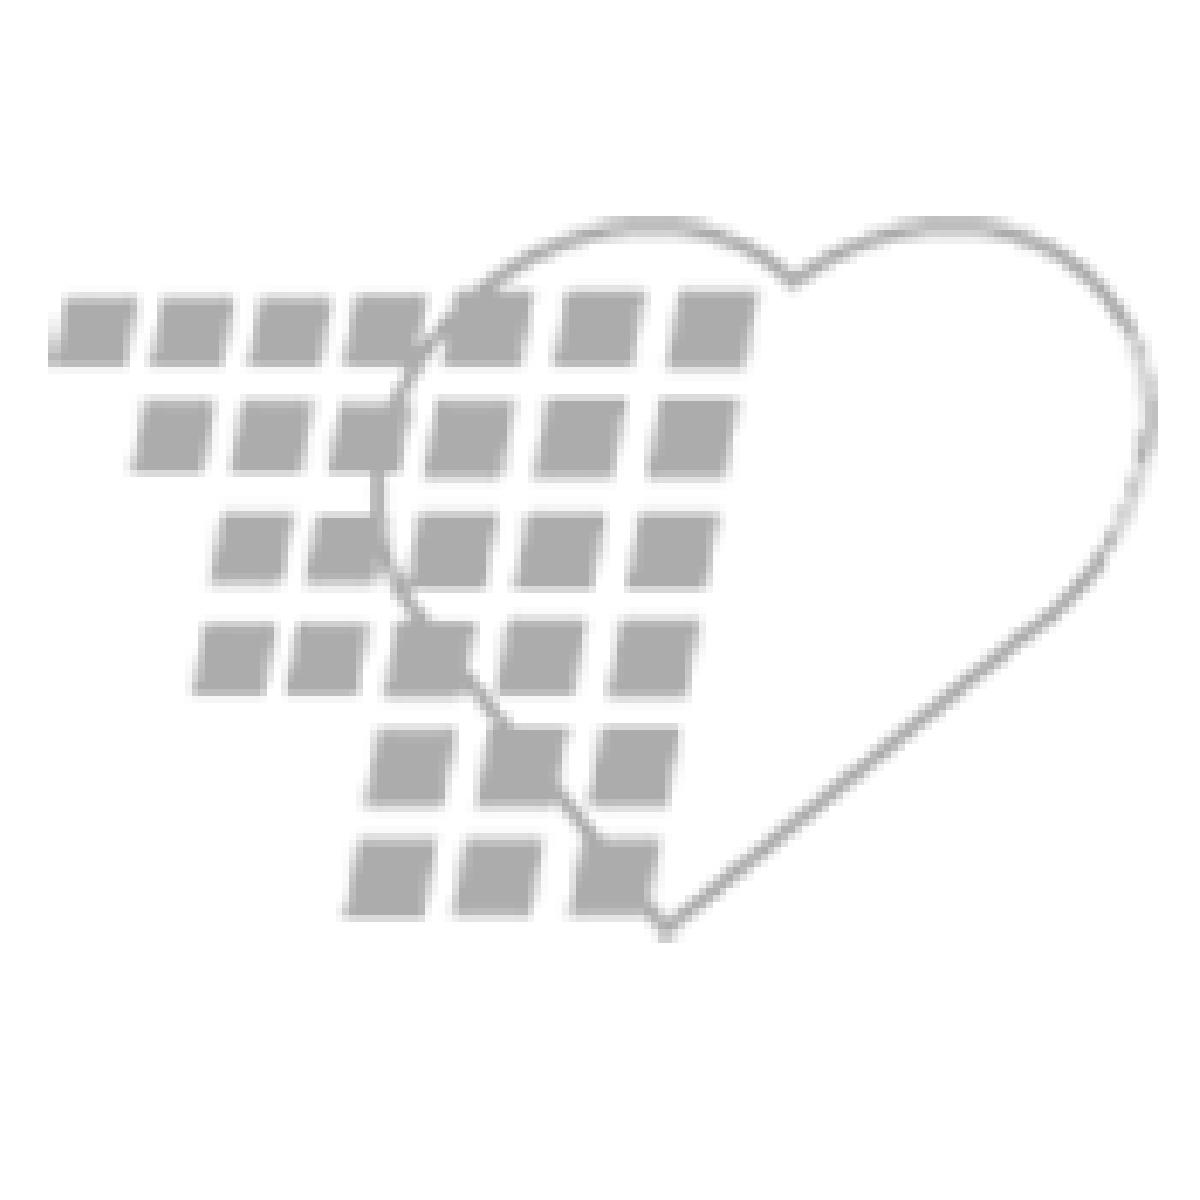 07-71-1530-GRN Portex® Acapella® DM & DH Vibratory PEP Therapy system